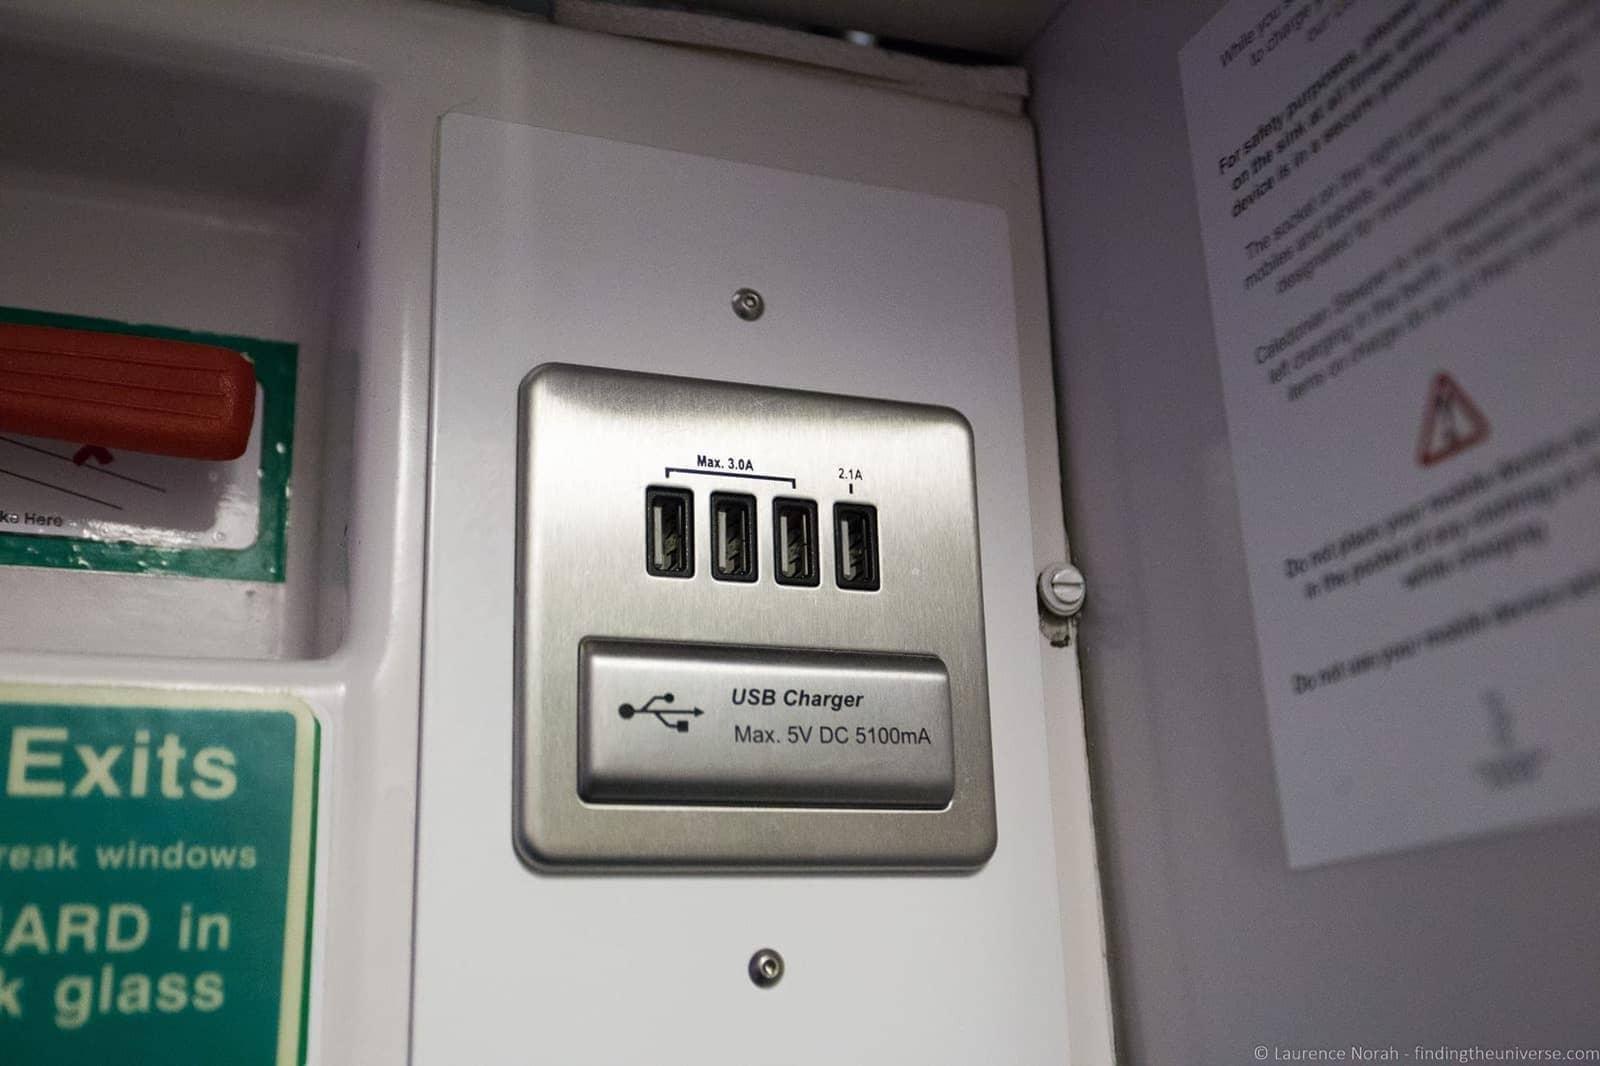 Caledonian Sleeper USB Power